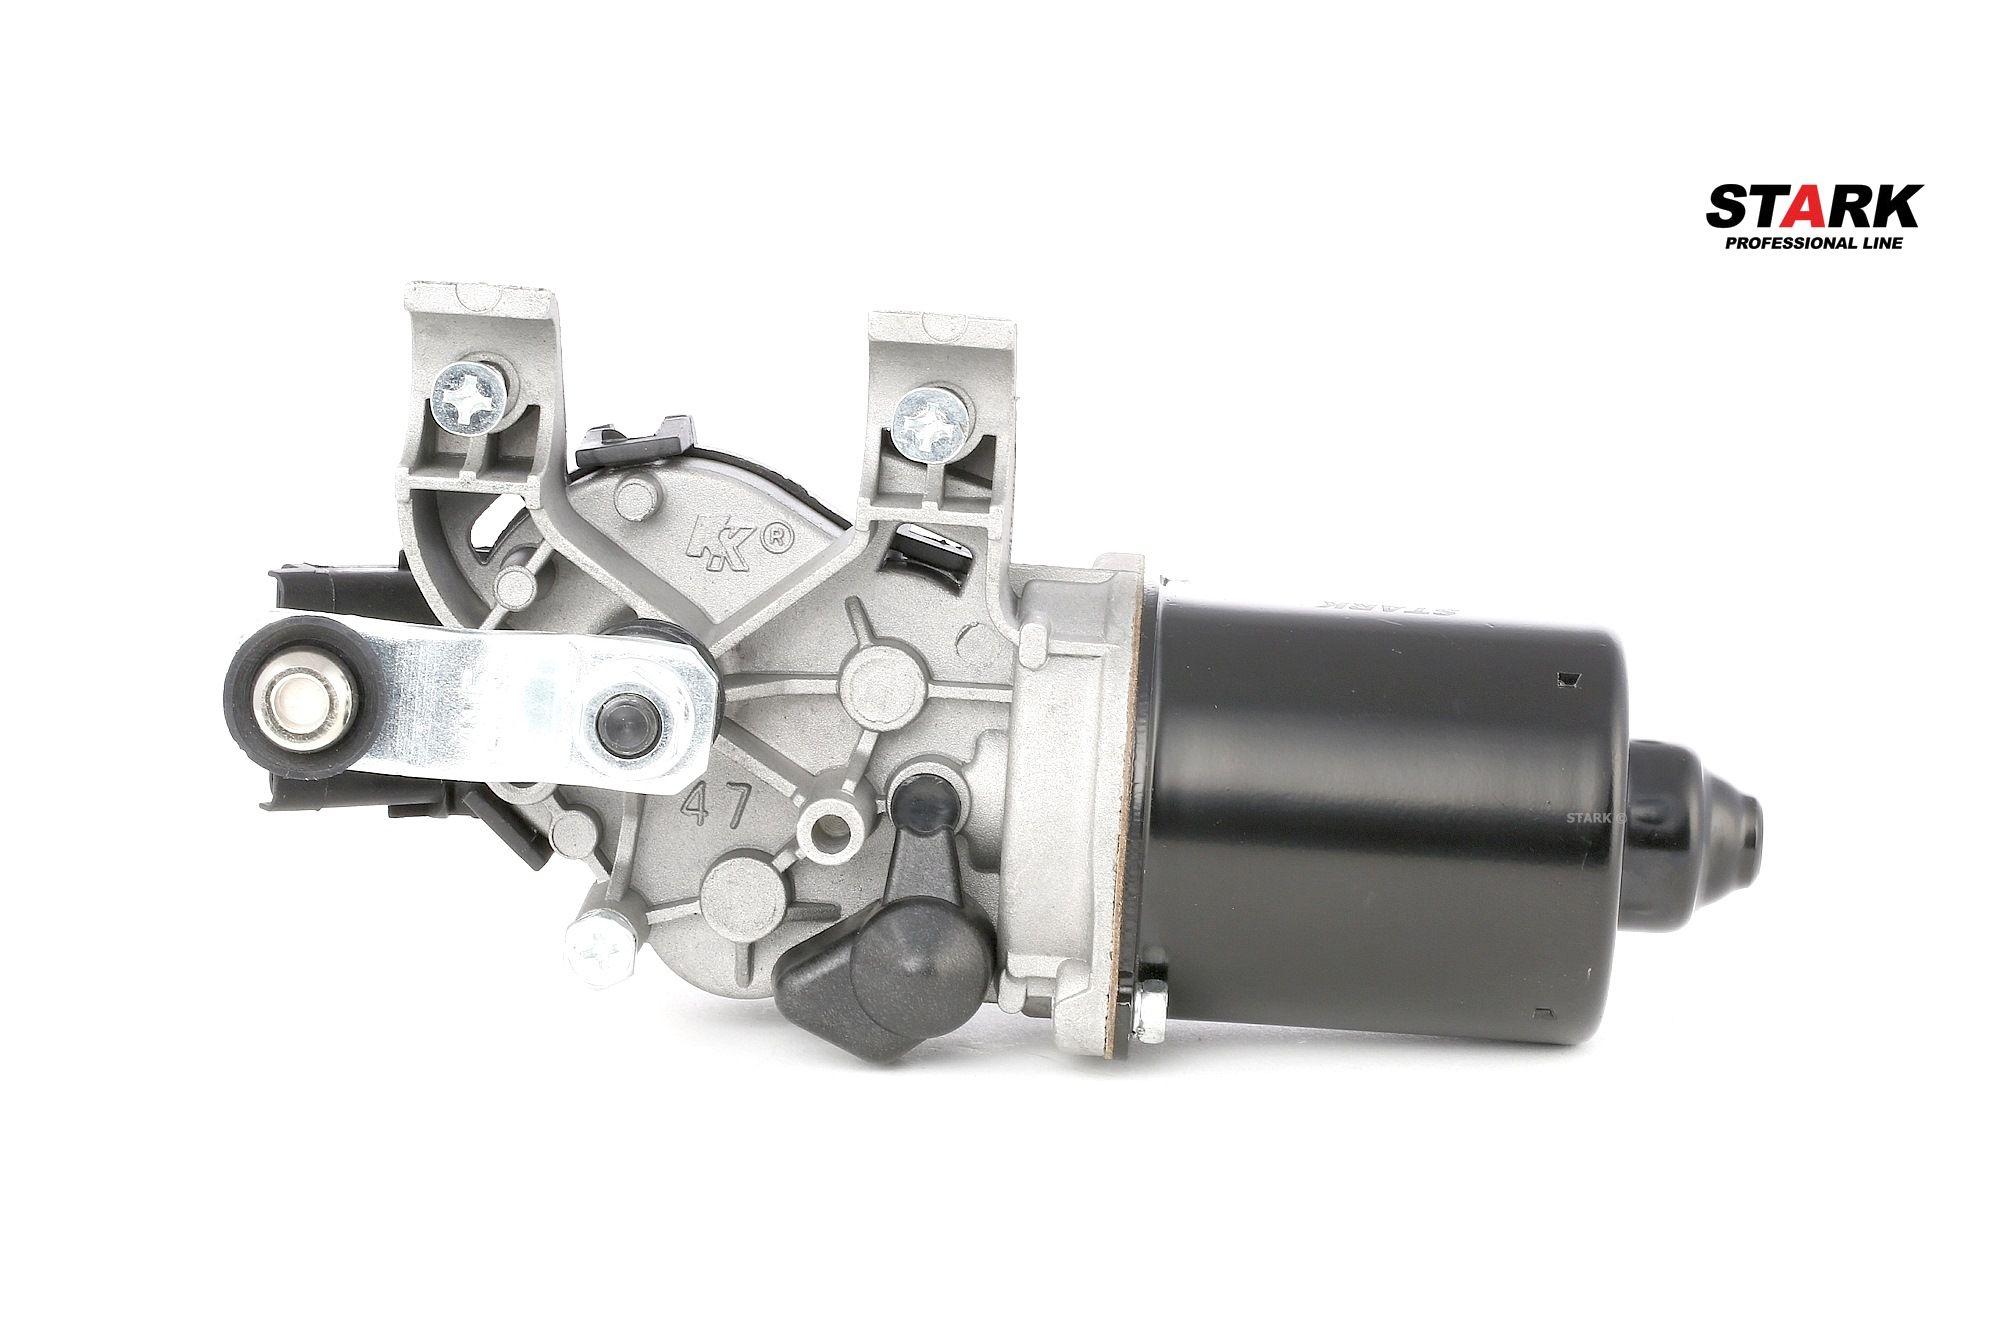 Windscreen Wiper Motor STARK SKWM-0290055 rating